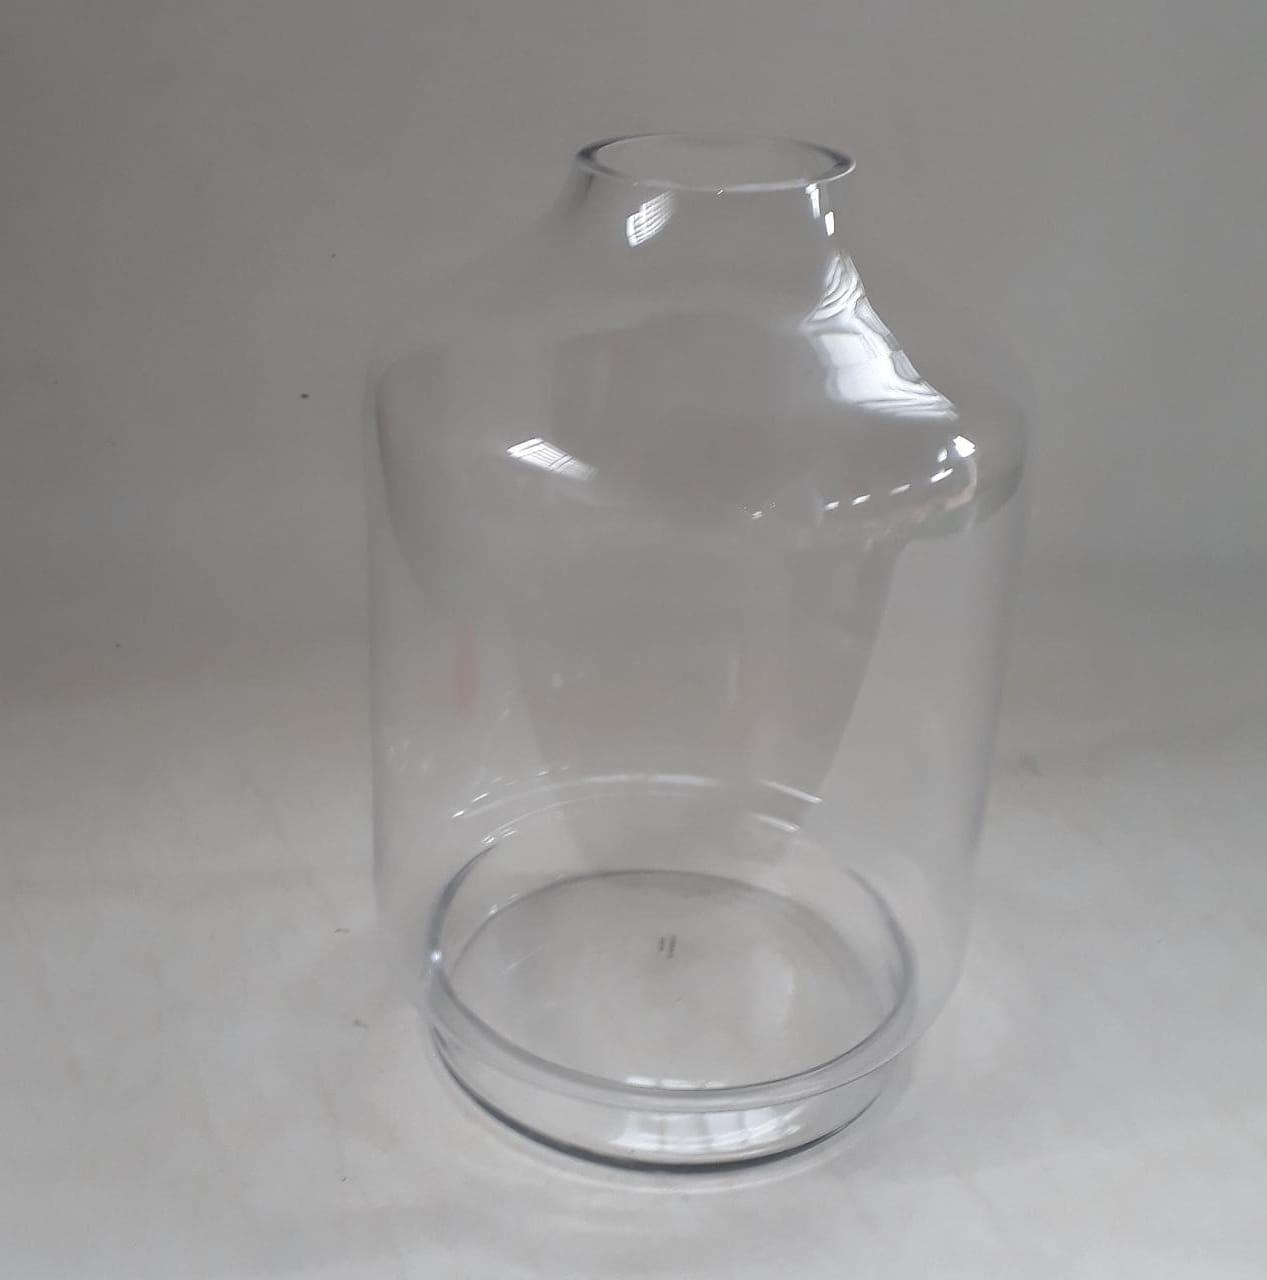 Vaso Vidro Incolor MV039-1 (A)